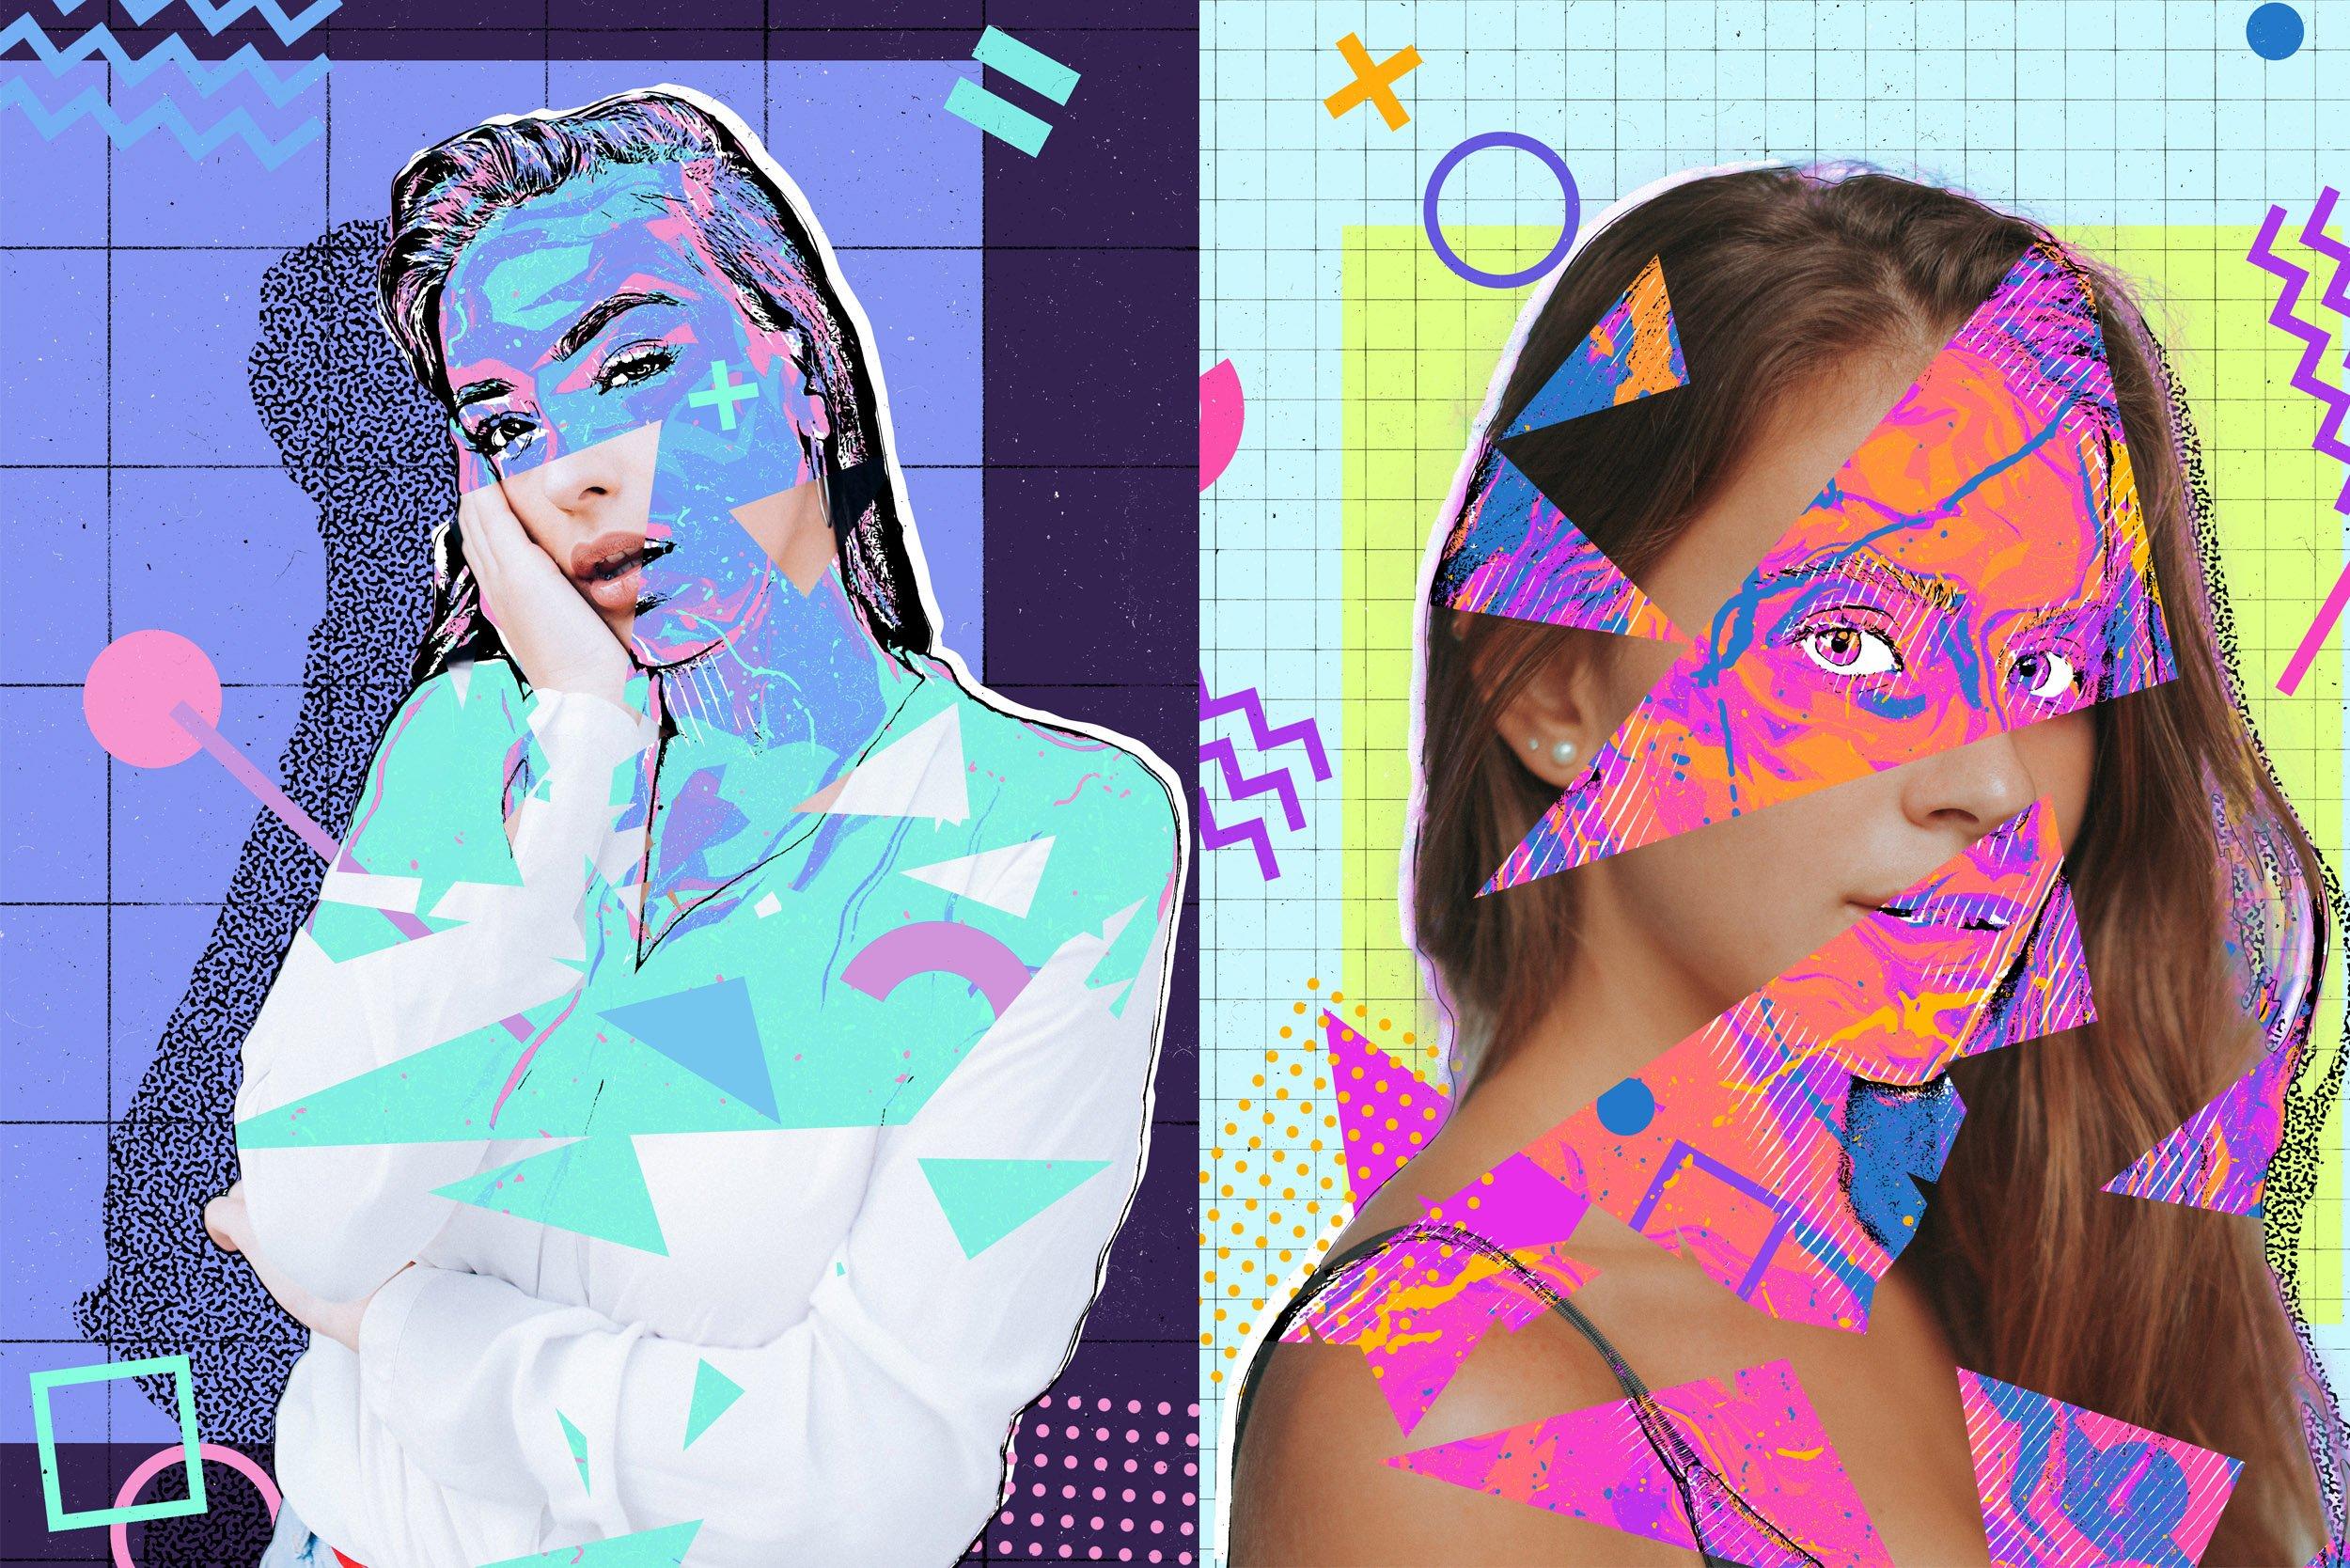 炫酷90年代多彩平面构图海报设计PS动作模板 Back To The 90s Photoshop Action插图5